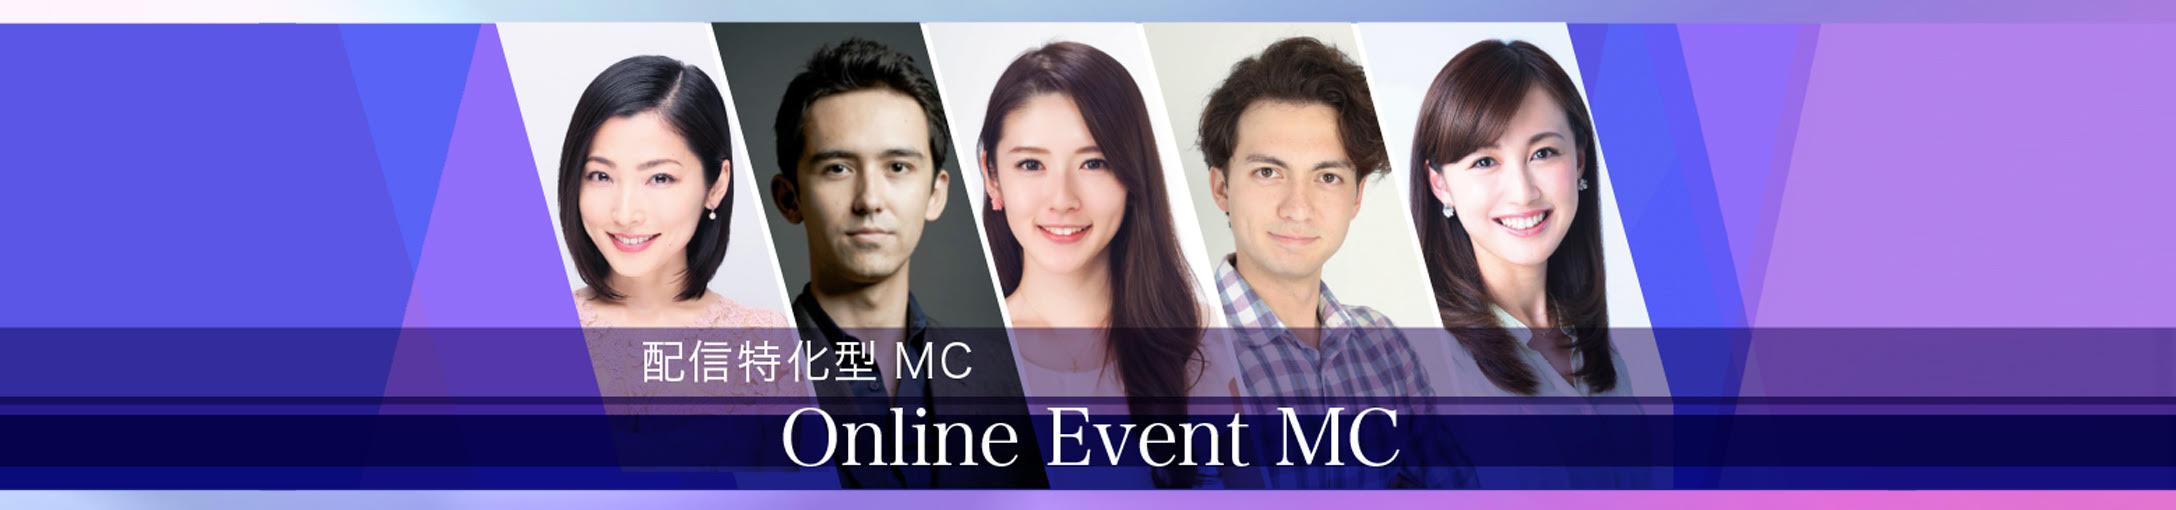 online_event_mc